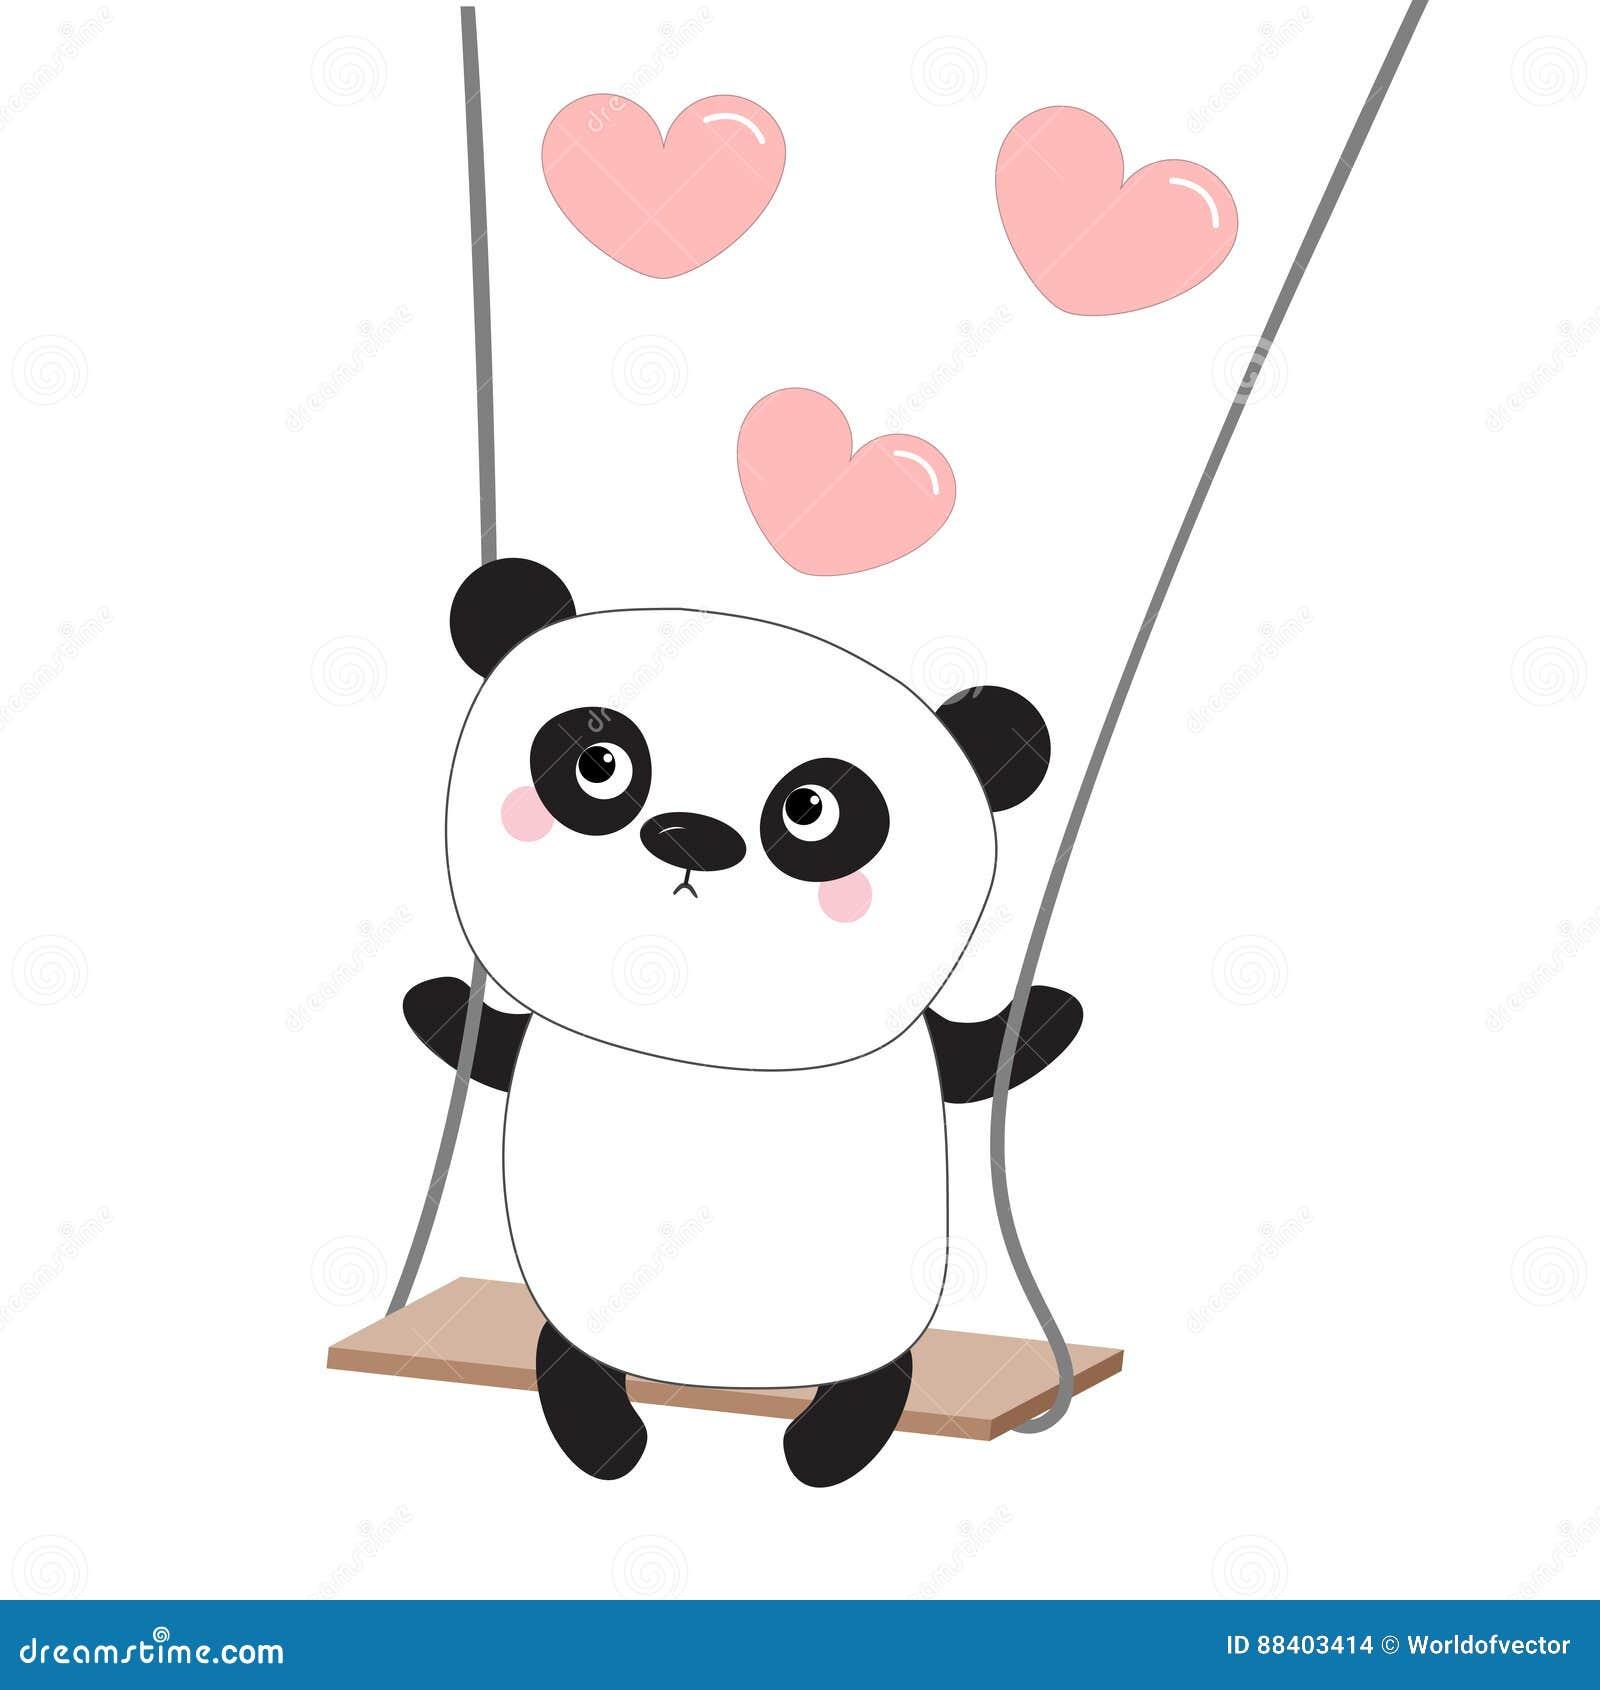 Panda ride on the swing pink flying hearts happy valentines day pink flying hearts happy valentines day symbol cute fat cartoon character kawaii baby collection love biocorpaavc